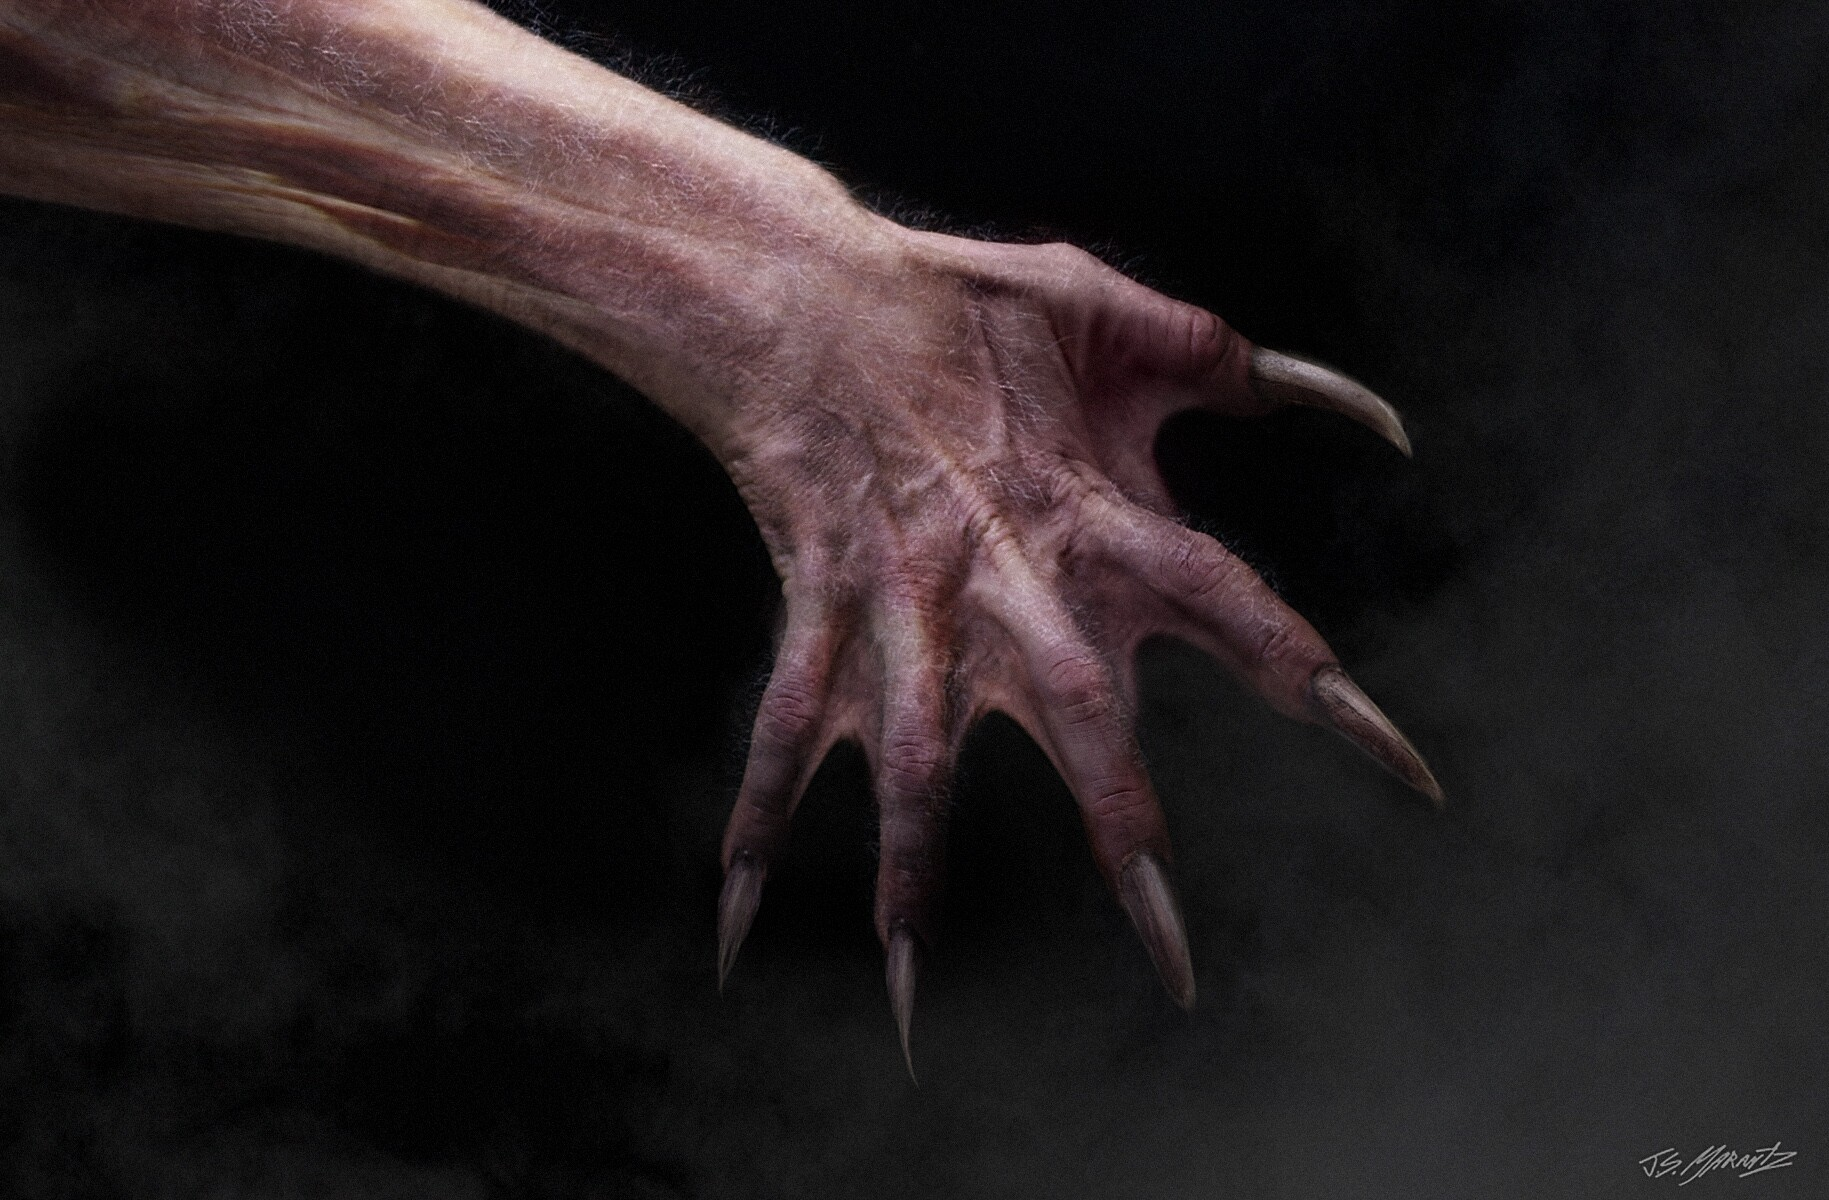 Jerx marantz bat claw revision 1